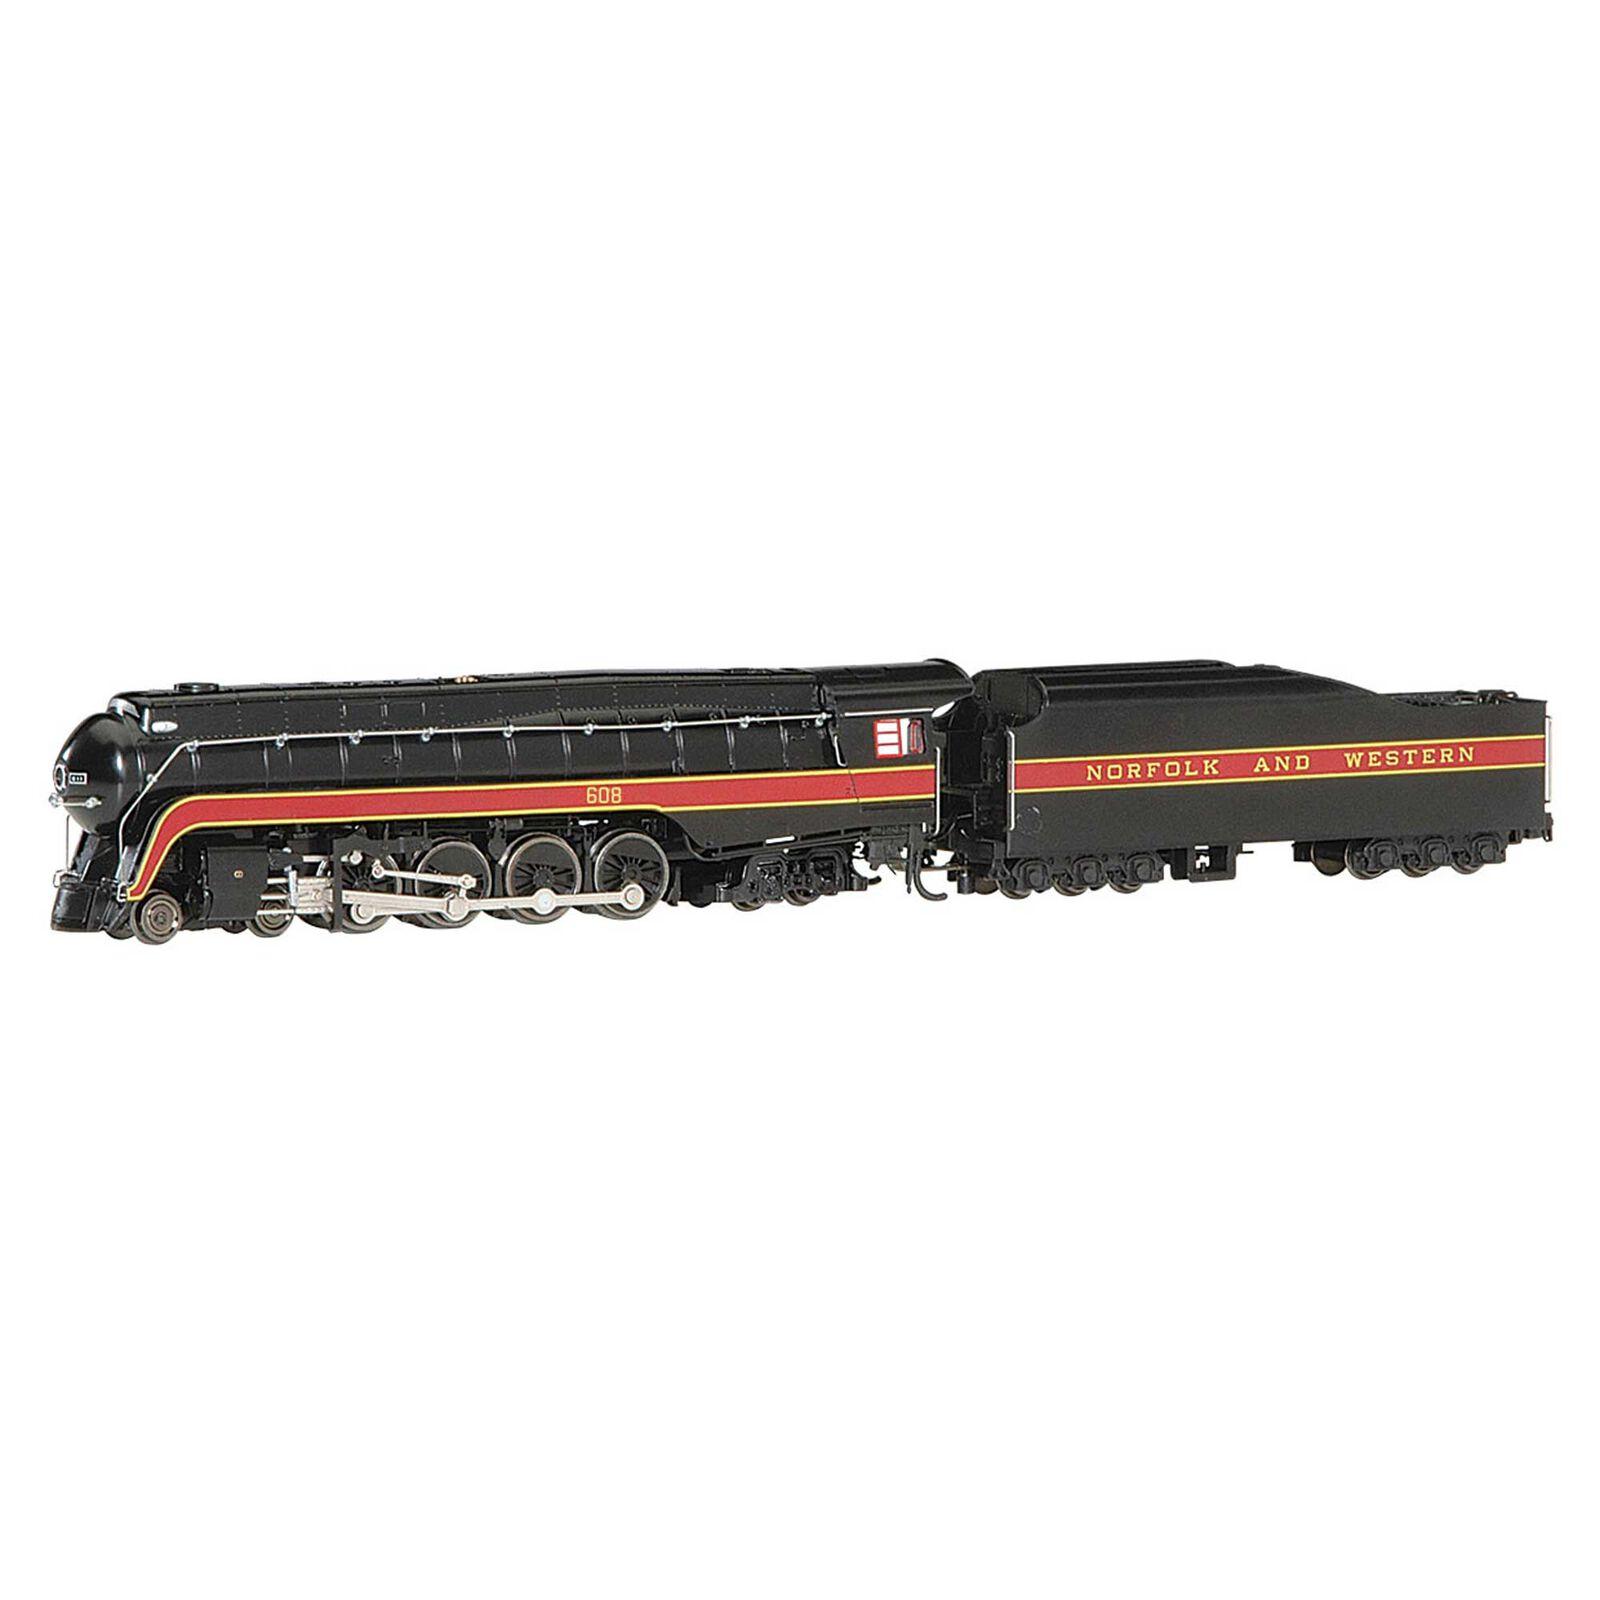 N 4-8-4 Class J N&W #608